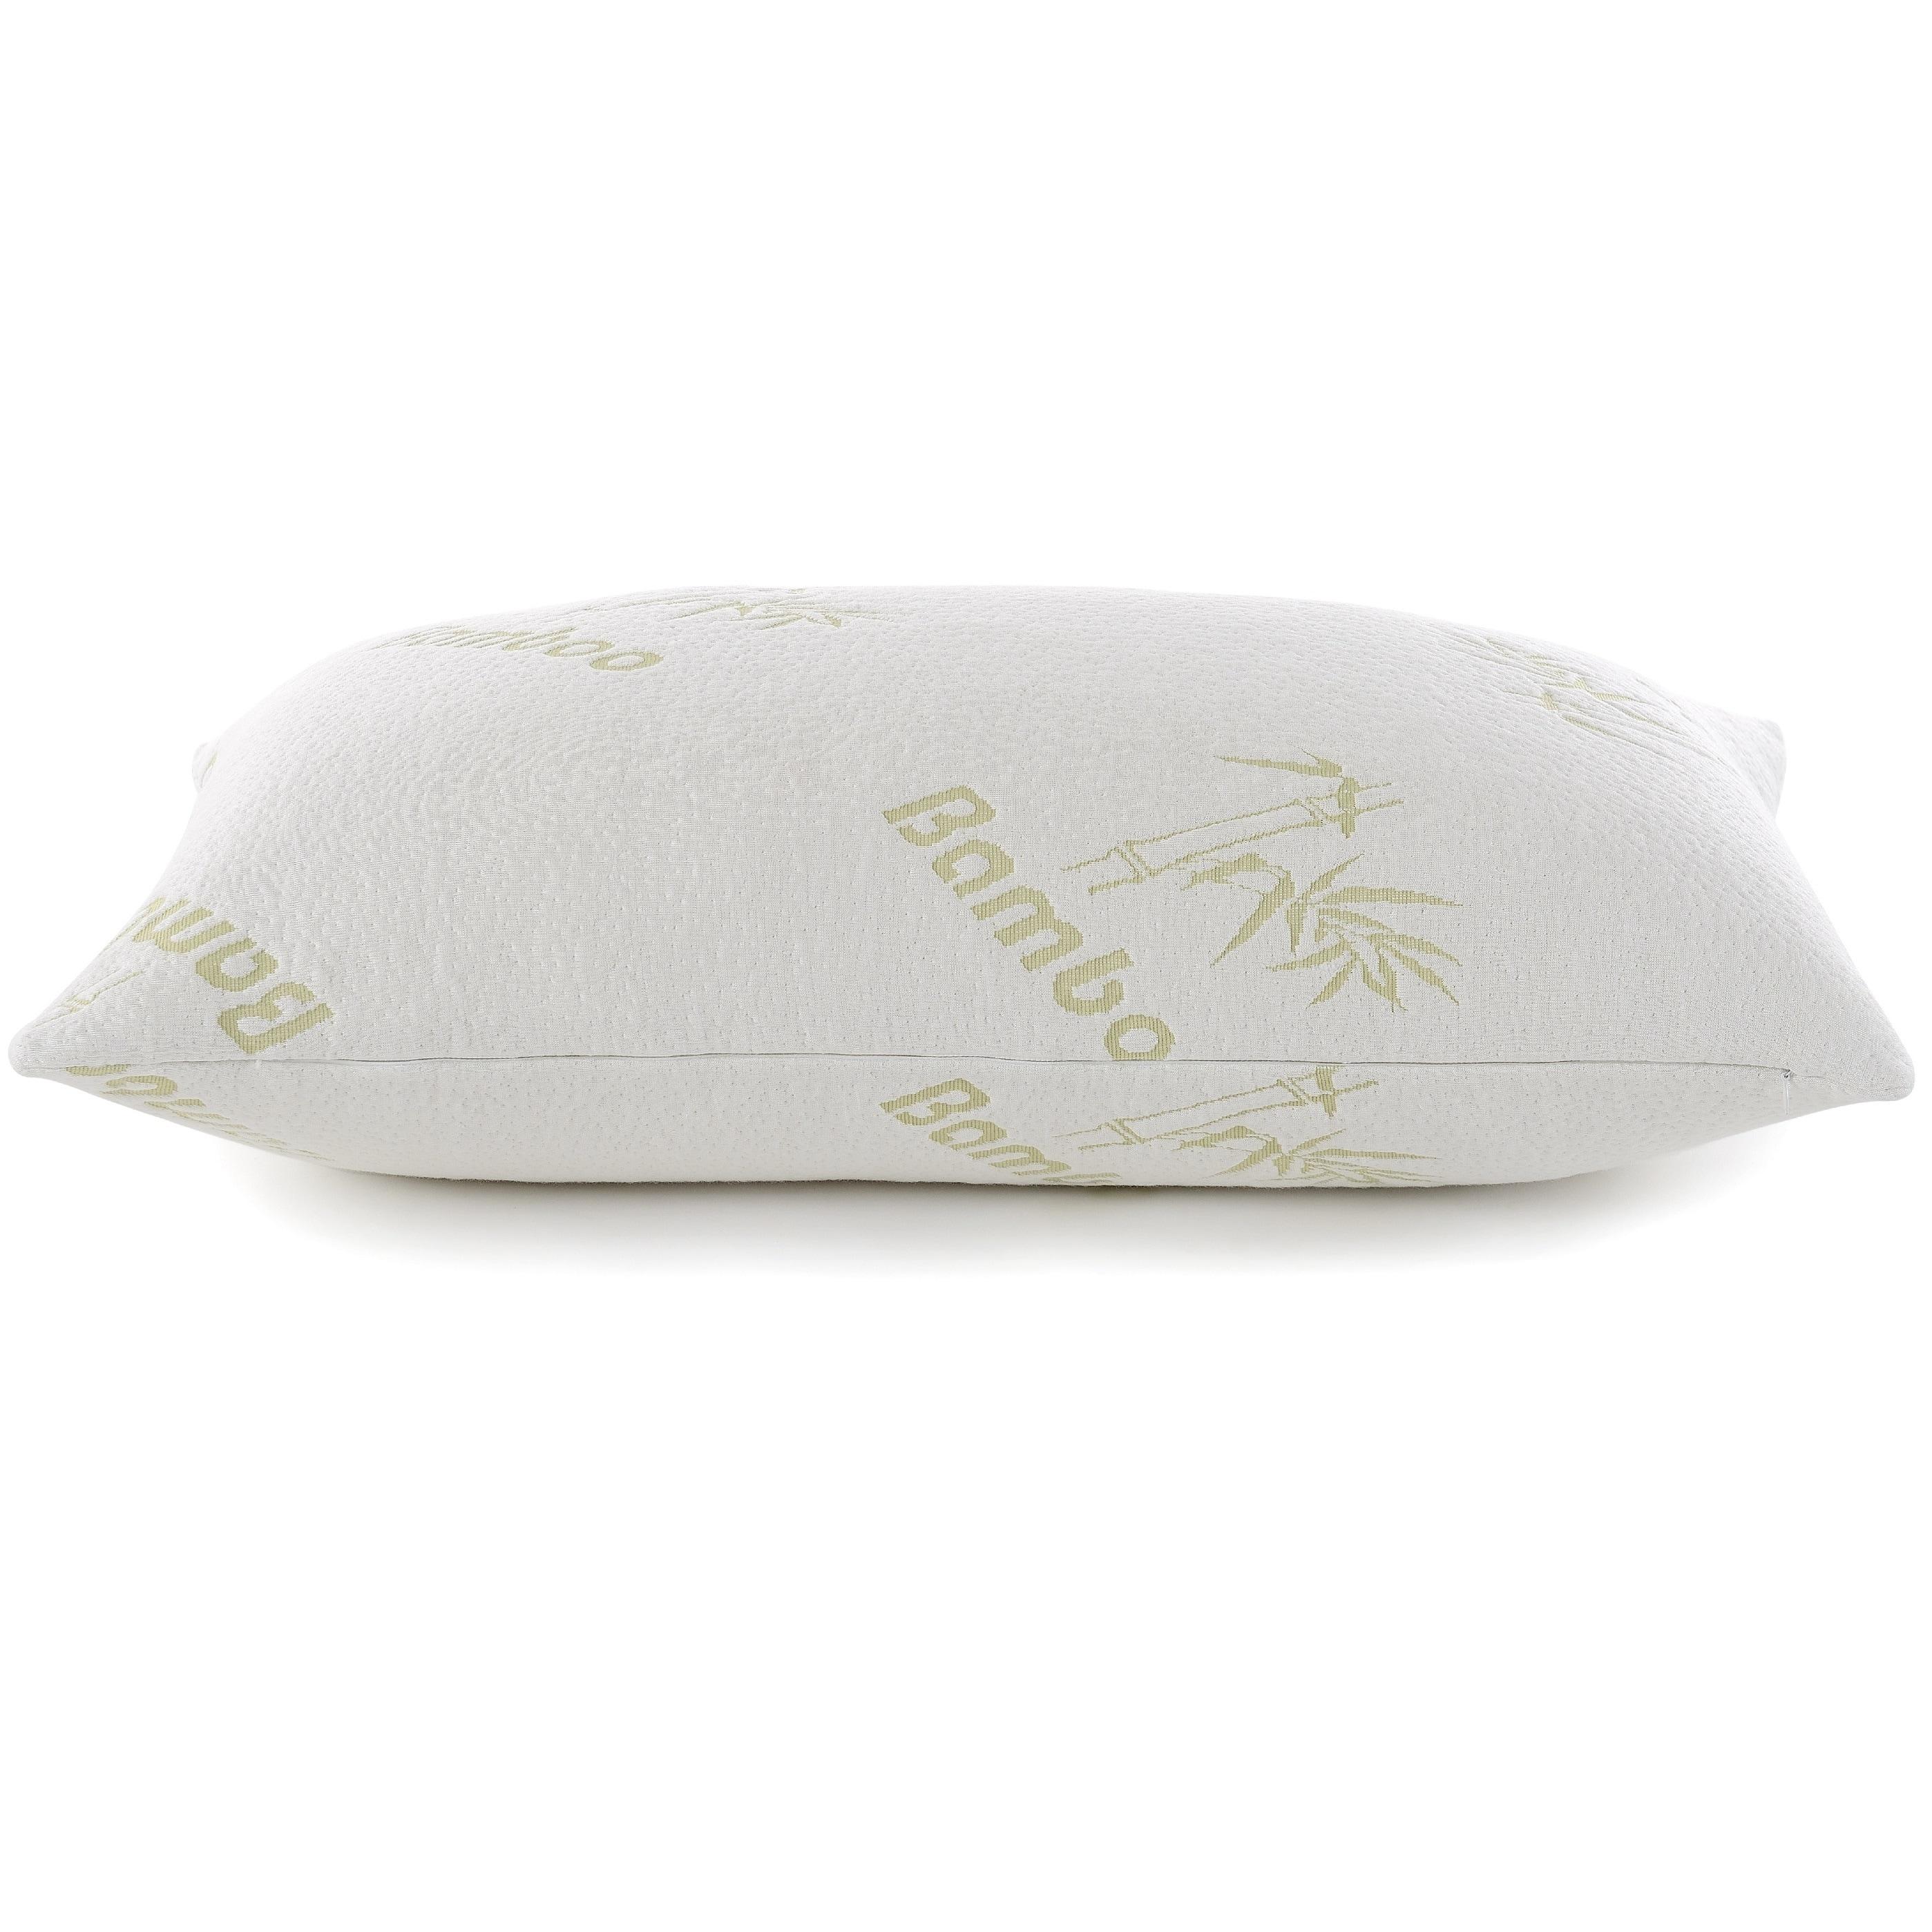 Cheer Collection Shredded Memory Foam Pillow (Standard/Qu...